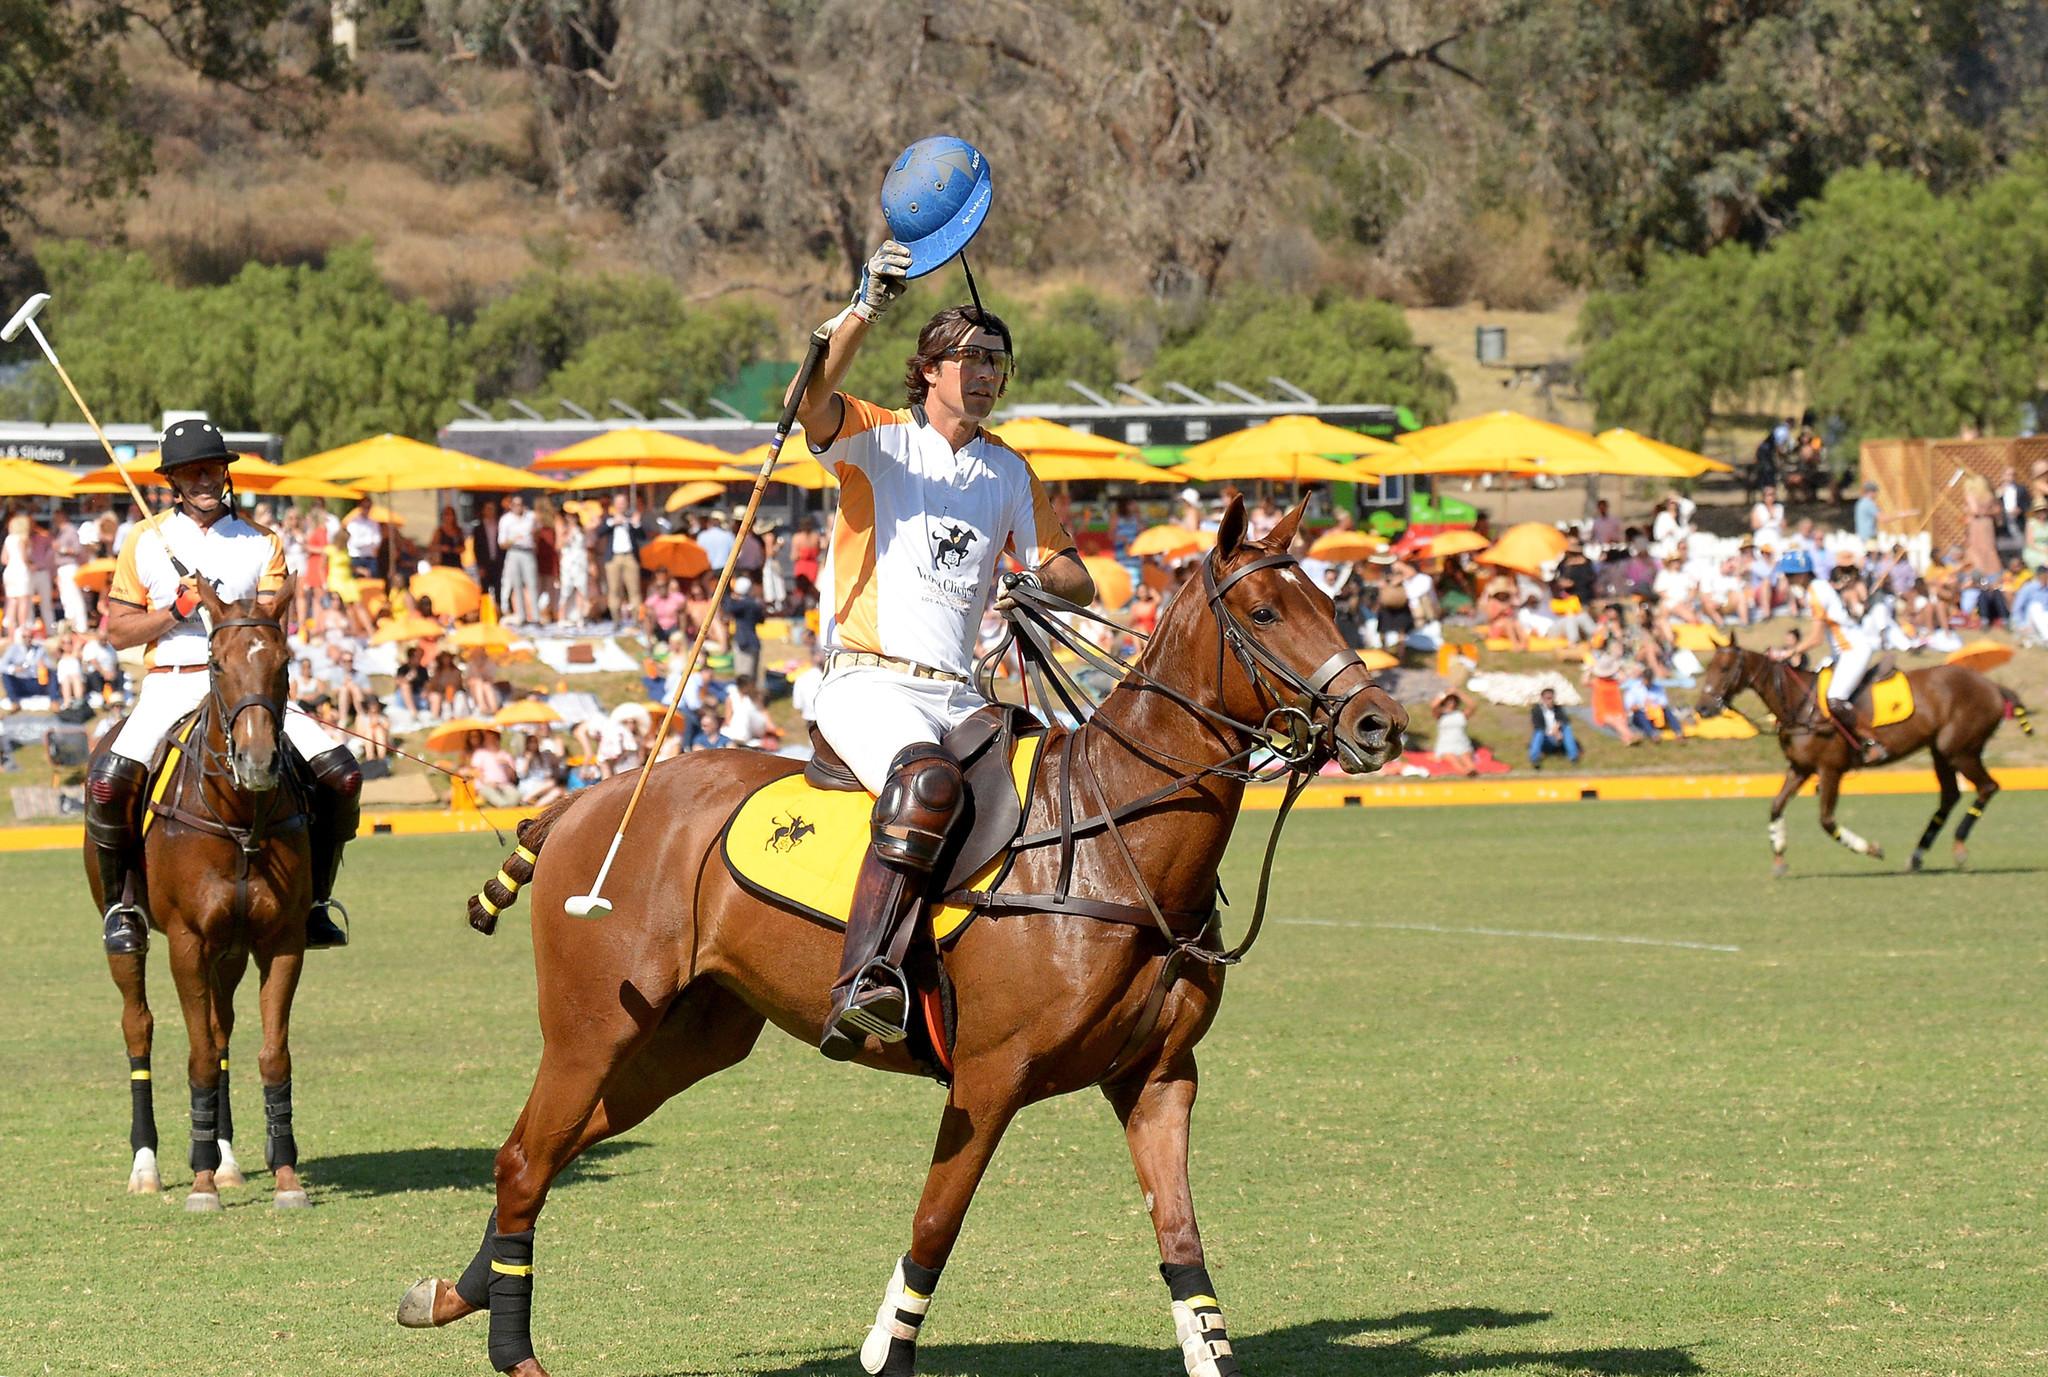 Nacho Figueras, center, at eighth annual Veuve Clicquot Polo Classic on Saturday.